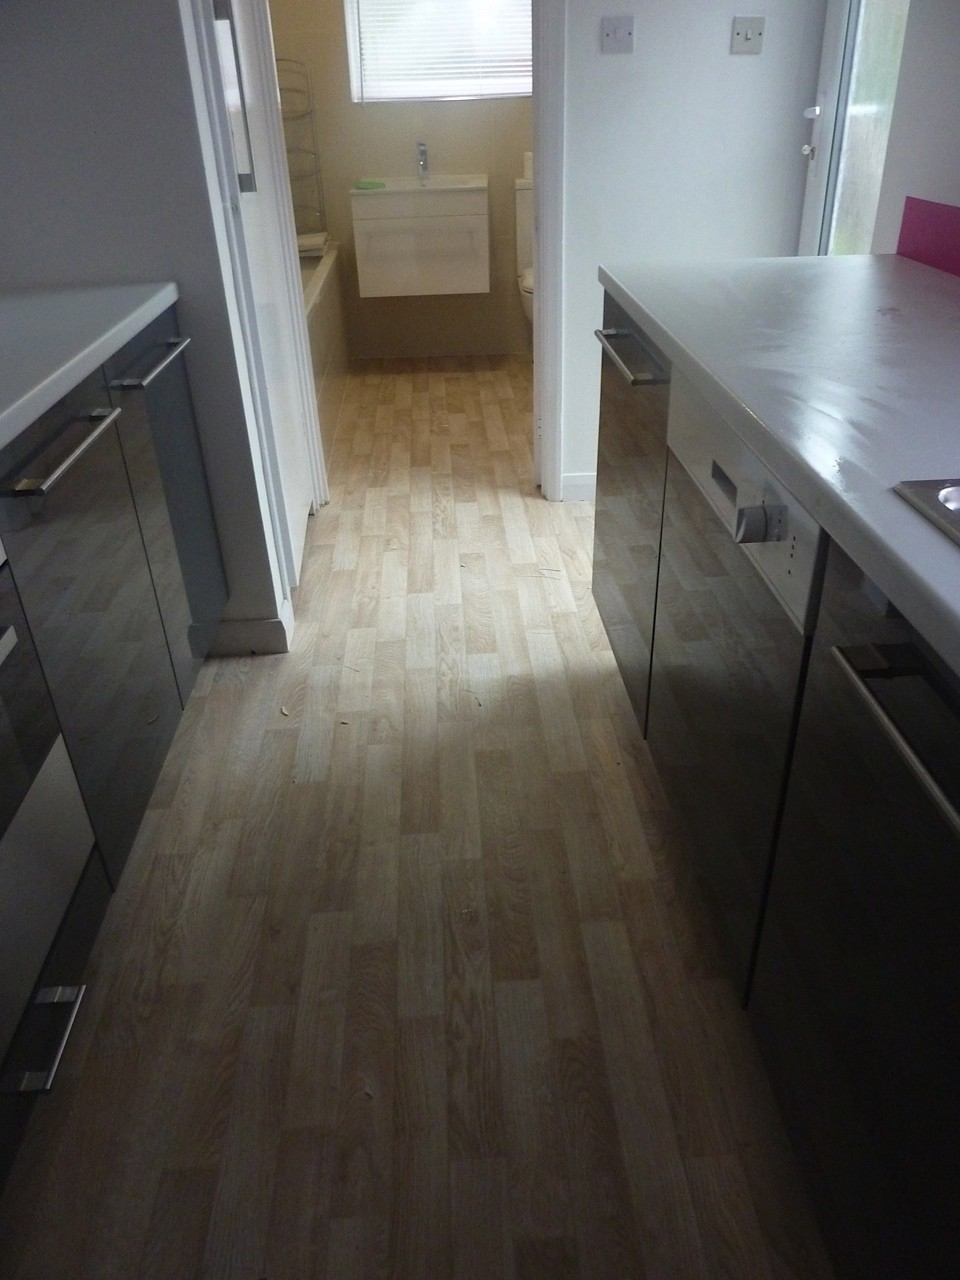 maison-moderne-chere-4-chambres-lits-doubles-84c4a2c387b7fb1f5f5bb77f7257f4dc